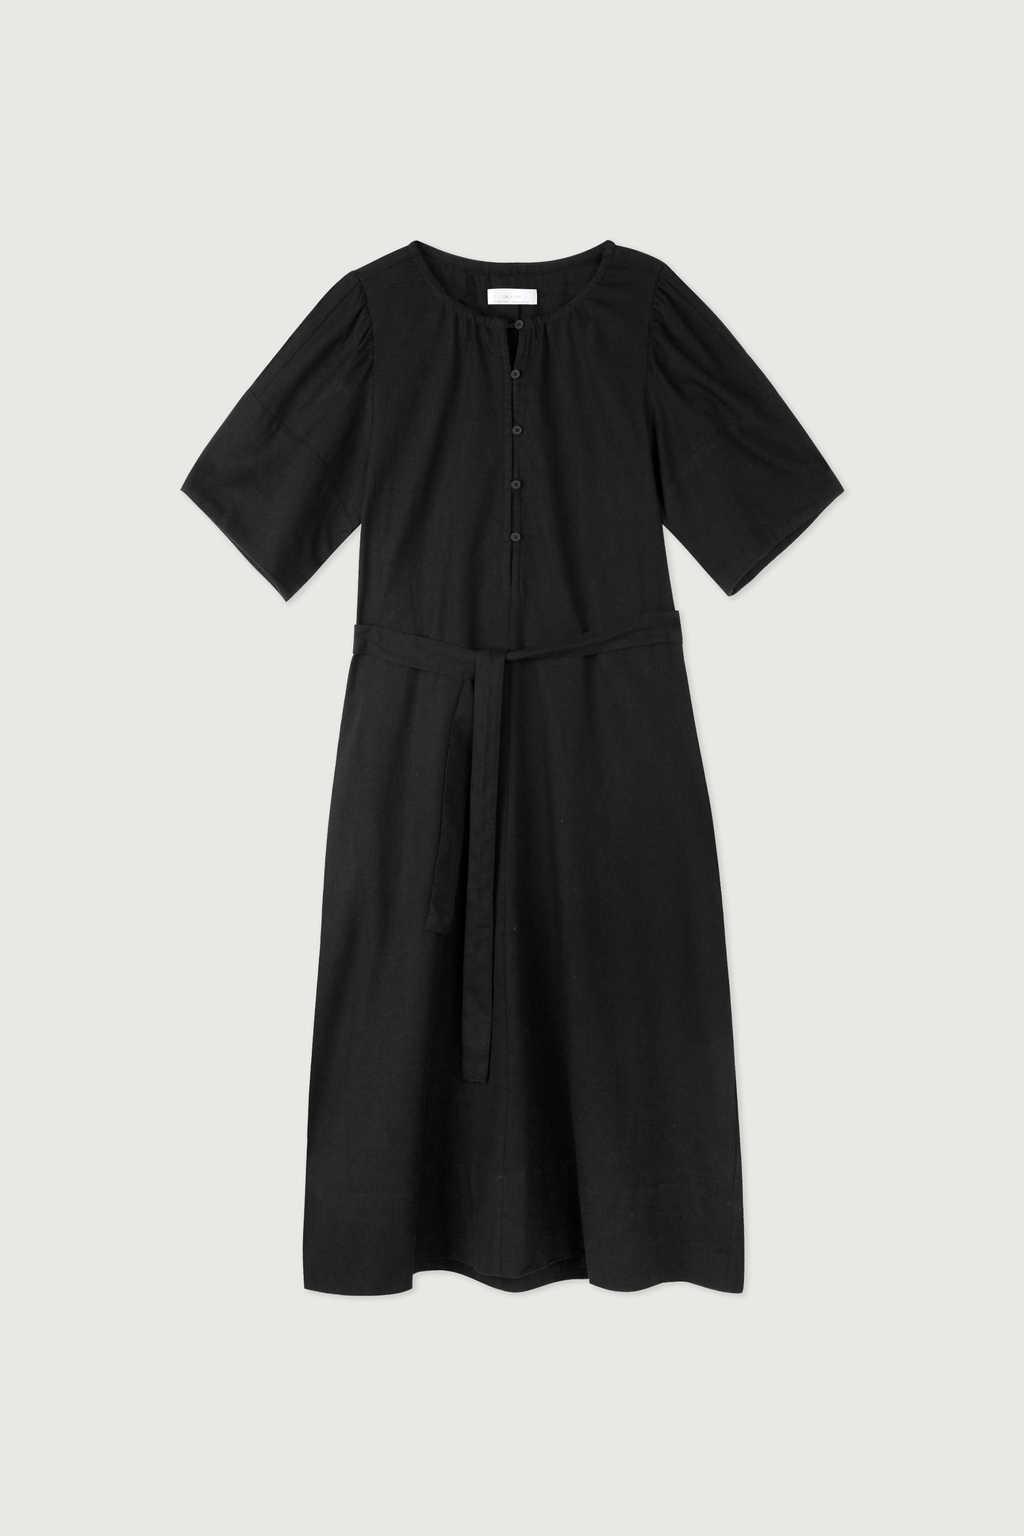 Dress 3263 Black 5